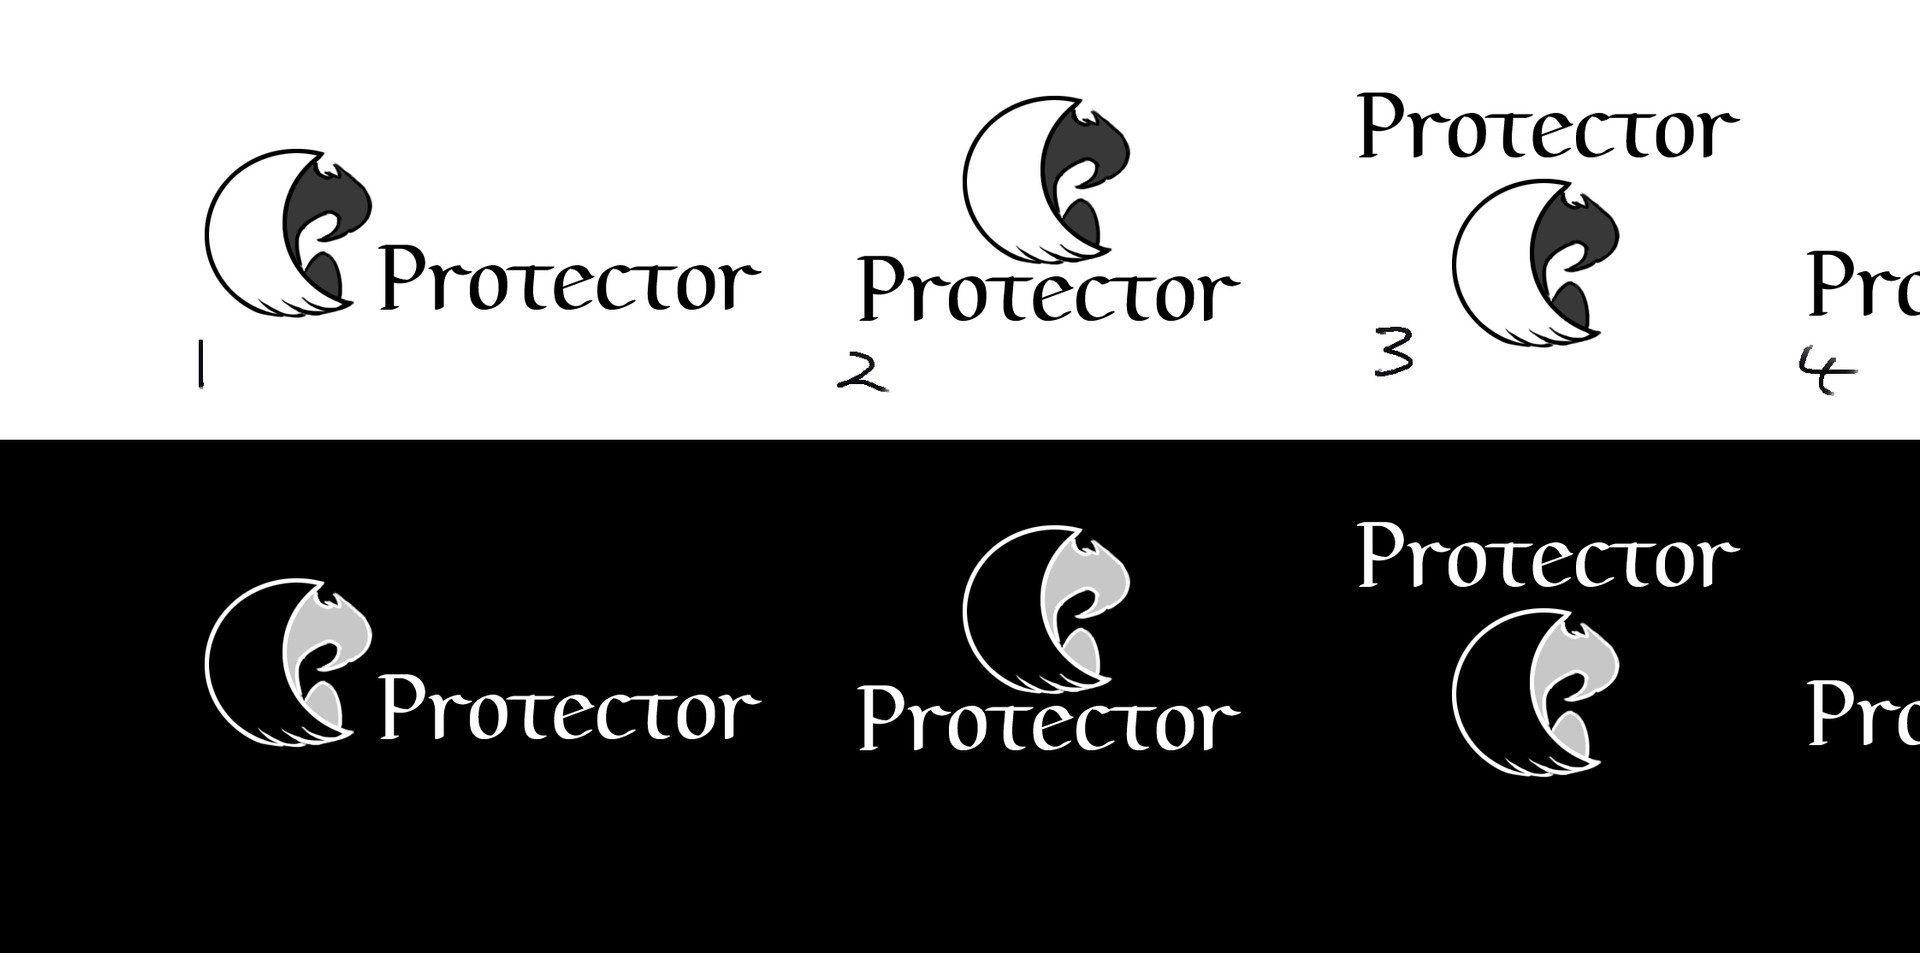 Protector Logos.JPG